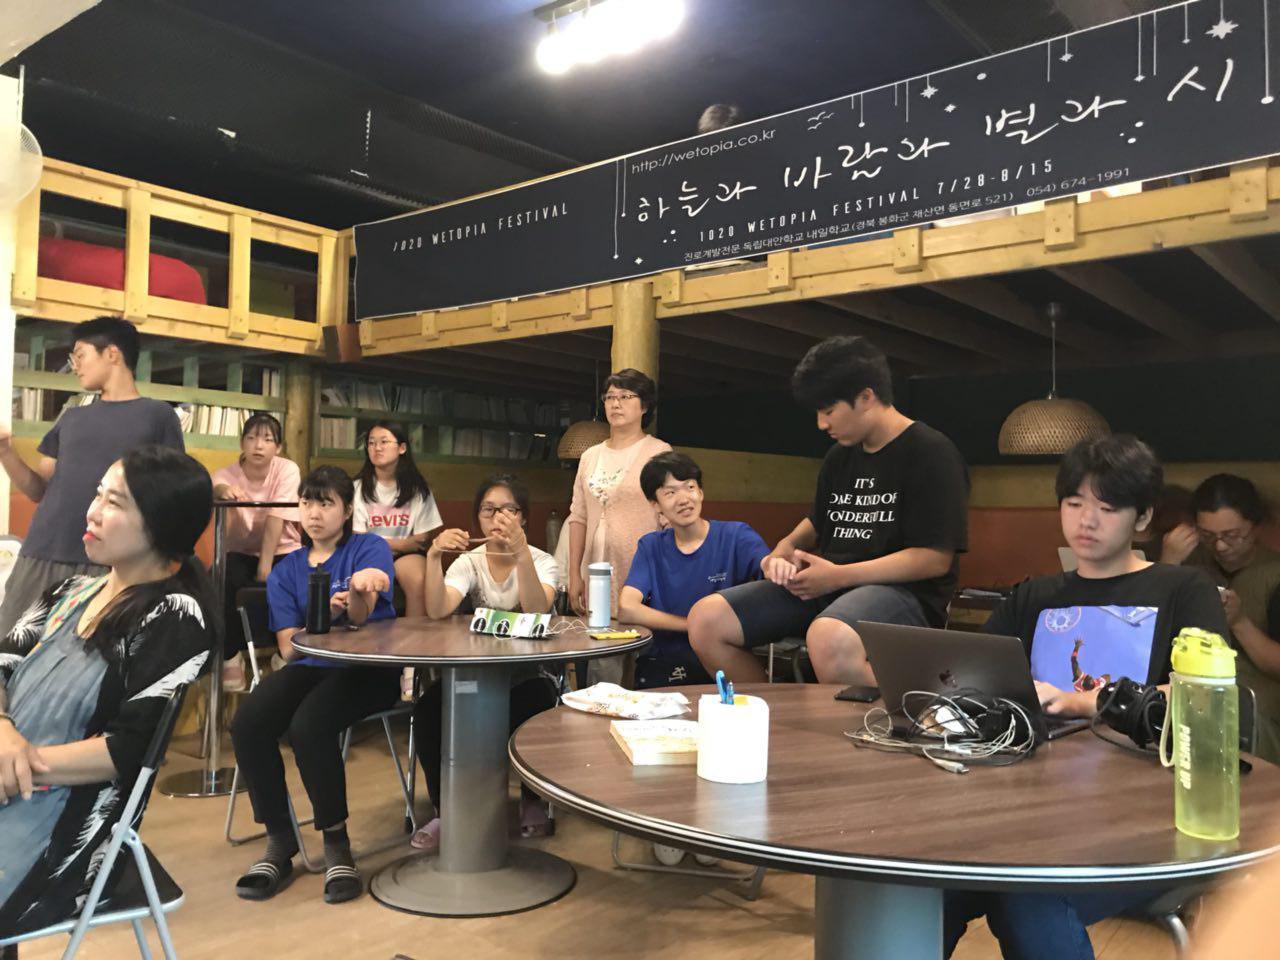 photo_2018-08-09_17-19-45.jpg